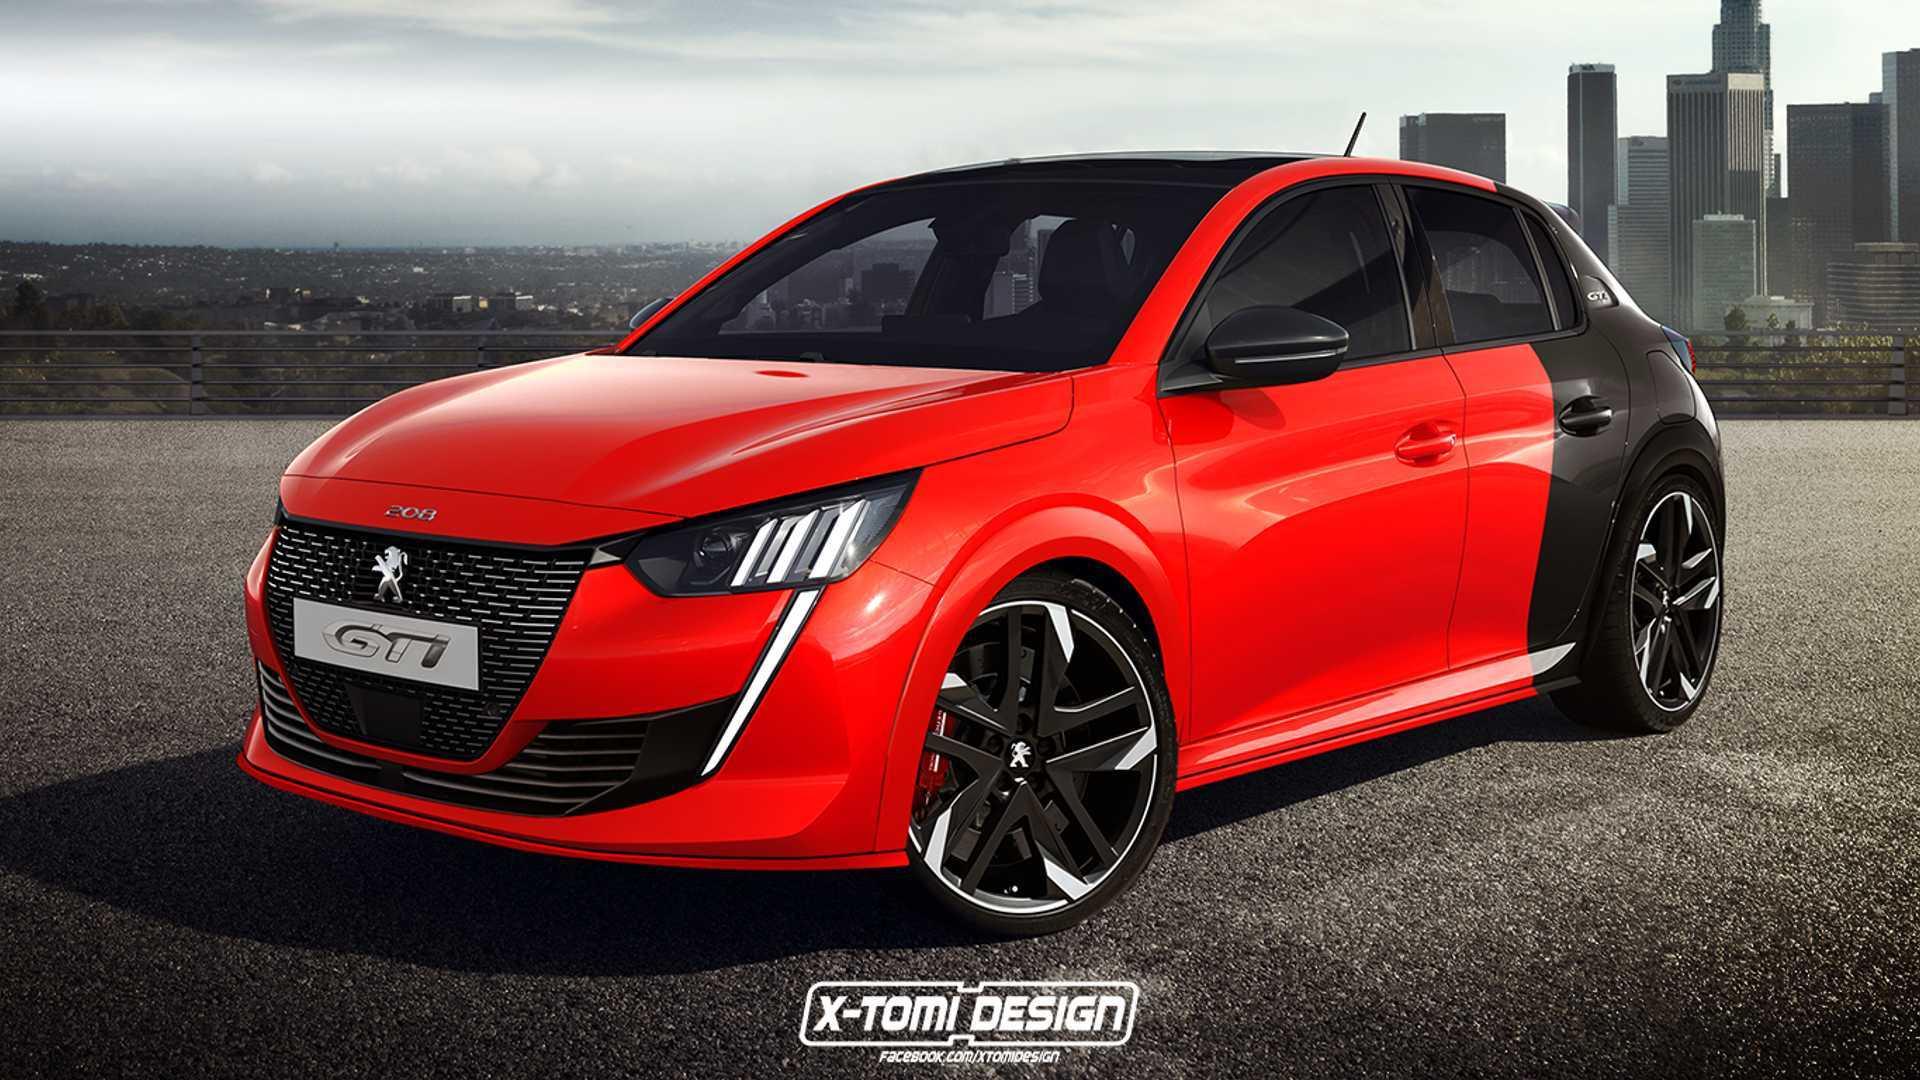 Novo Peugeot 208 GTi terá motor 1.6 turbo de 225 cv Peugeot-208-gti-2020